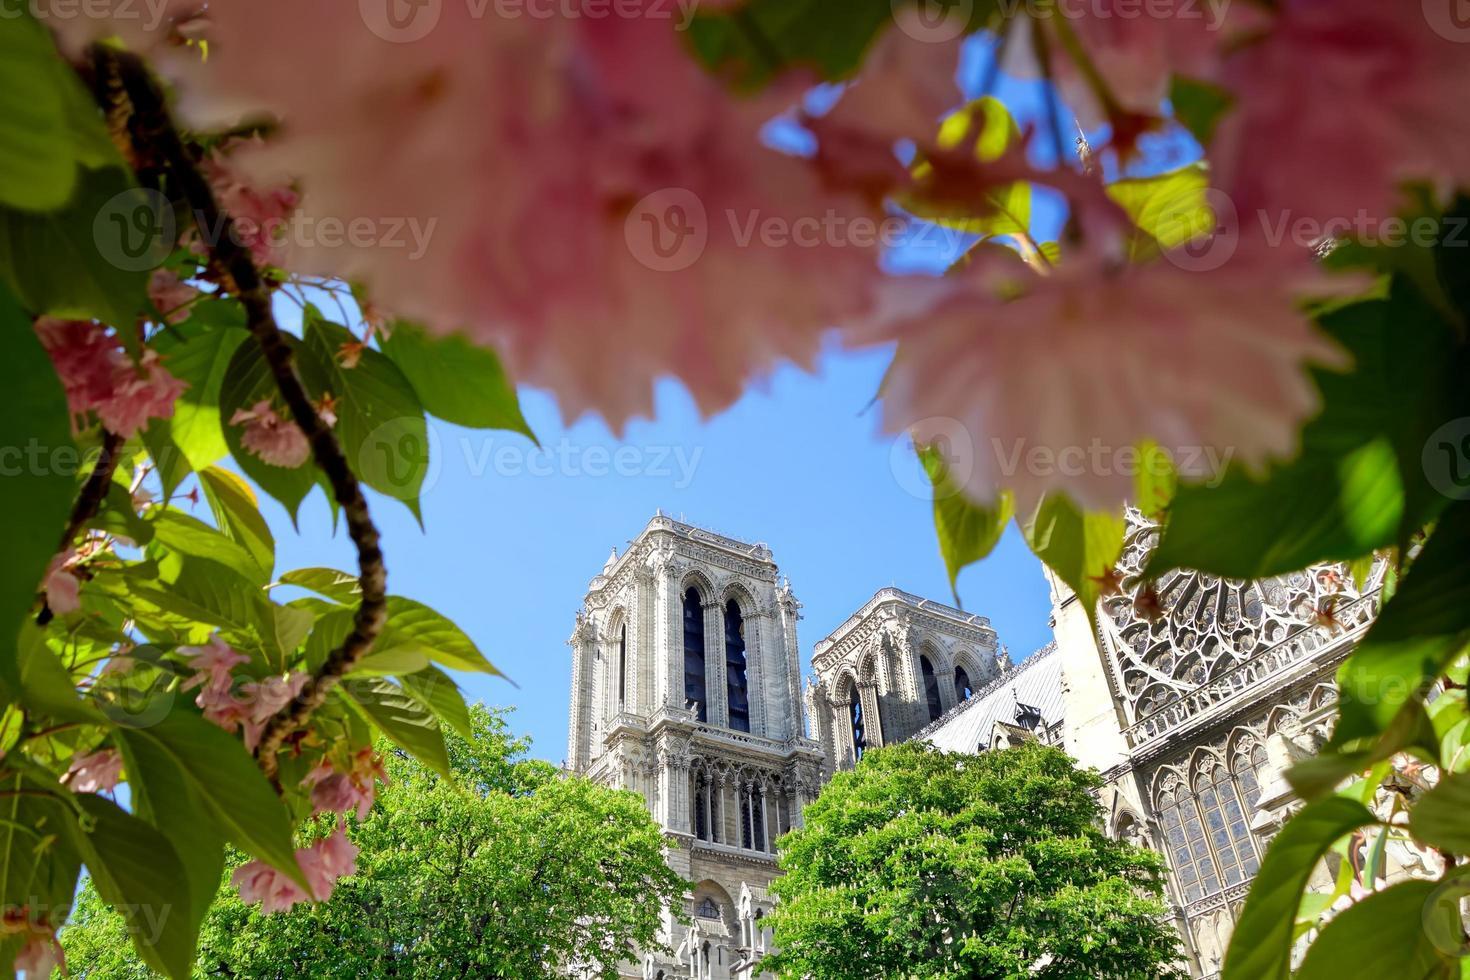 Notre Dame durante la primavera a Parigi, Francia foto